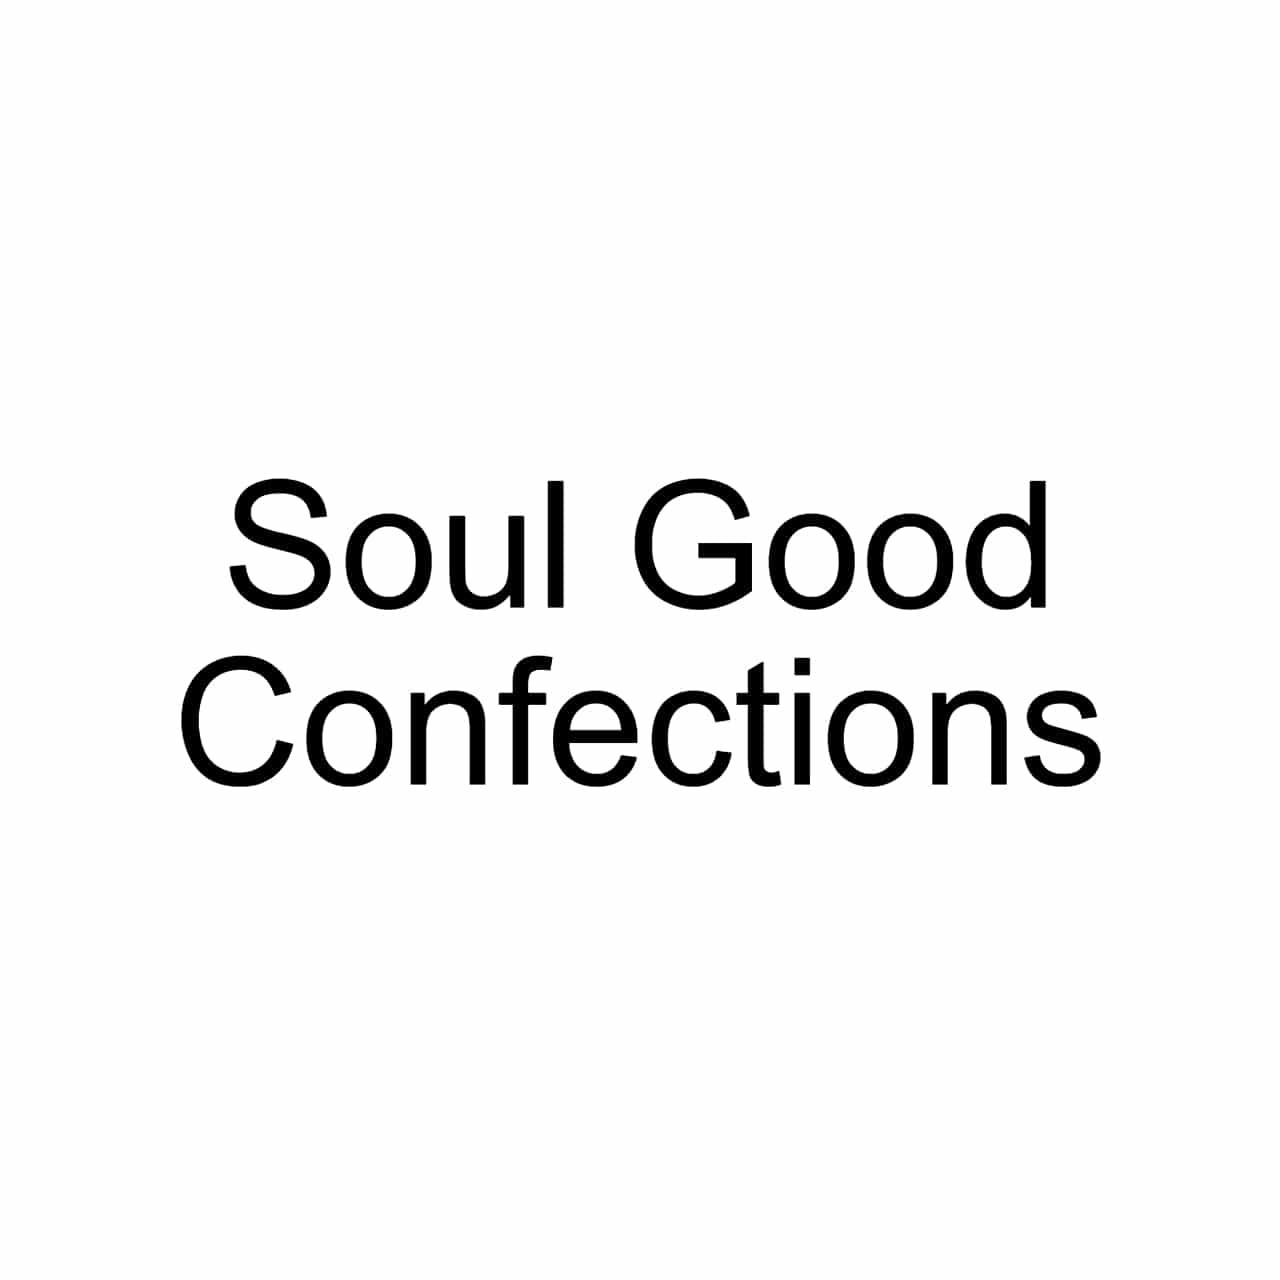 soul_good_confections_logo_placeholder